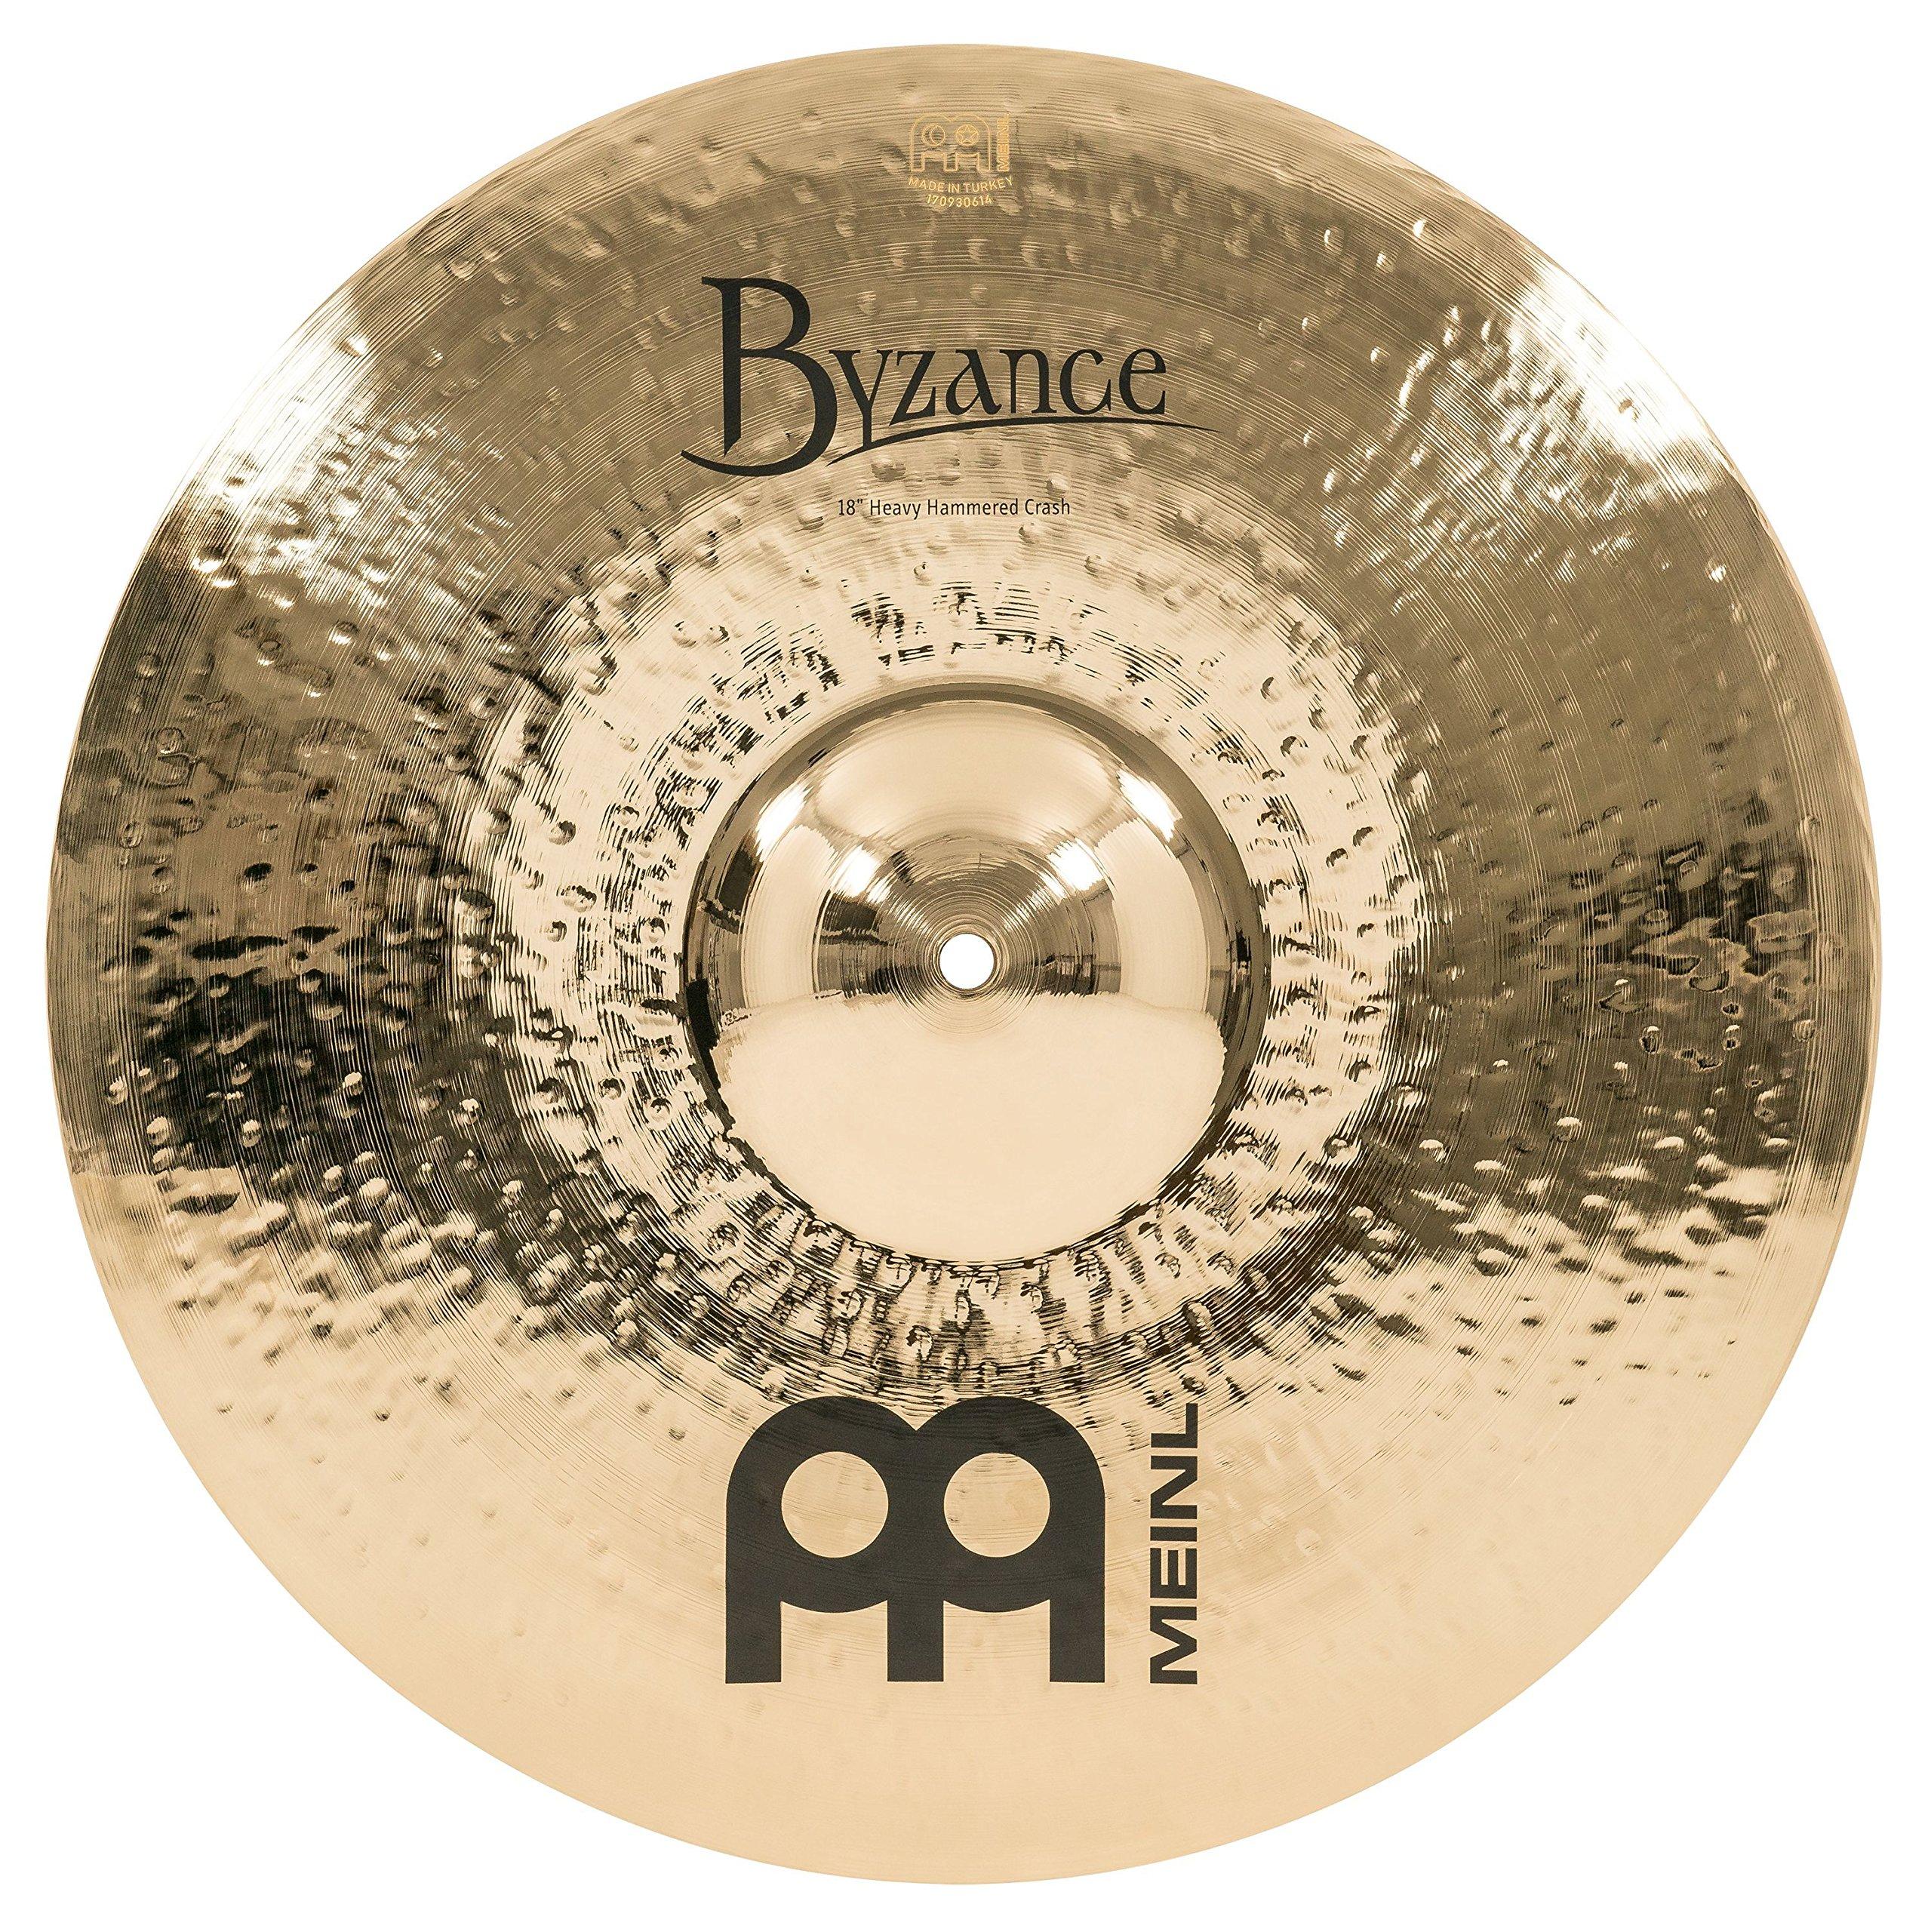 Meinl Cymbals Crash Ride Cymbal (B18HHC-B) by Meinl Cymbals